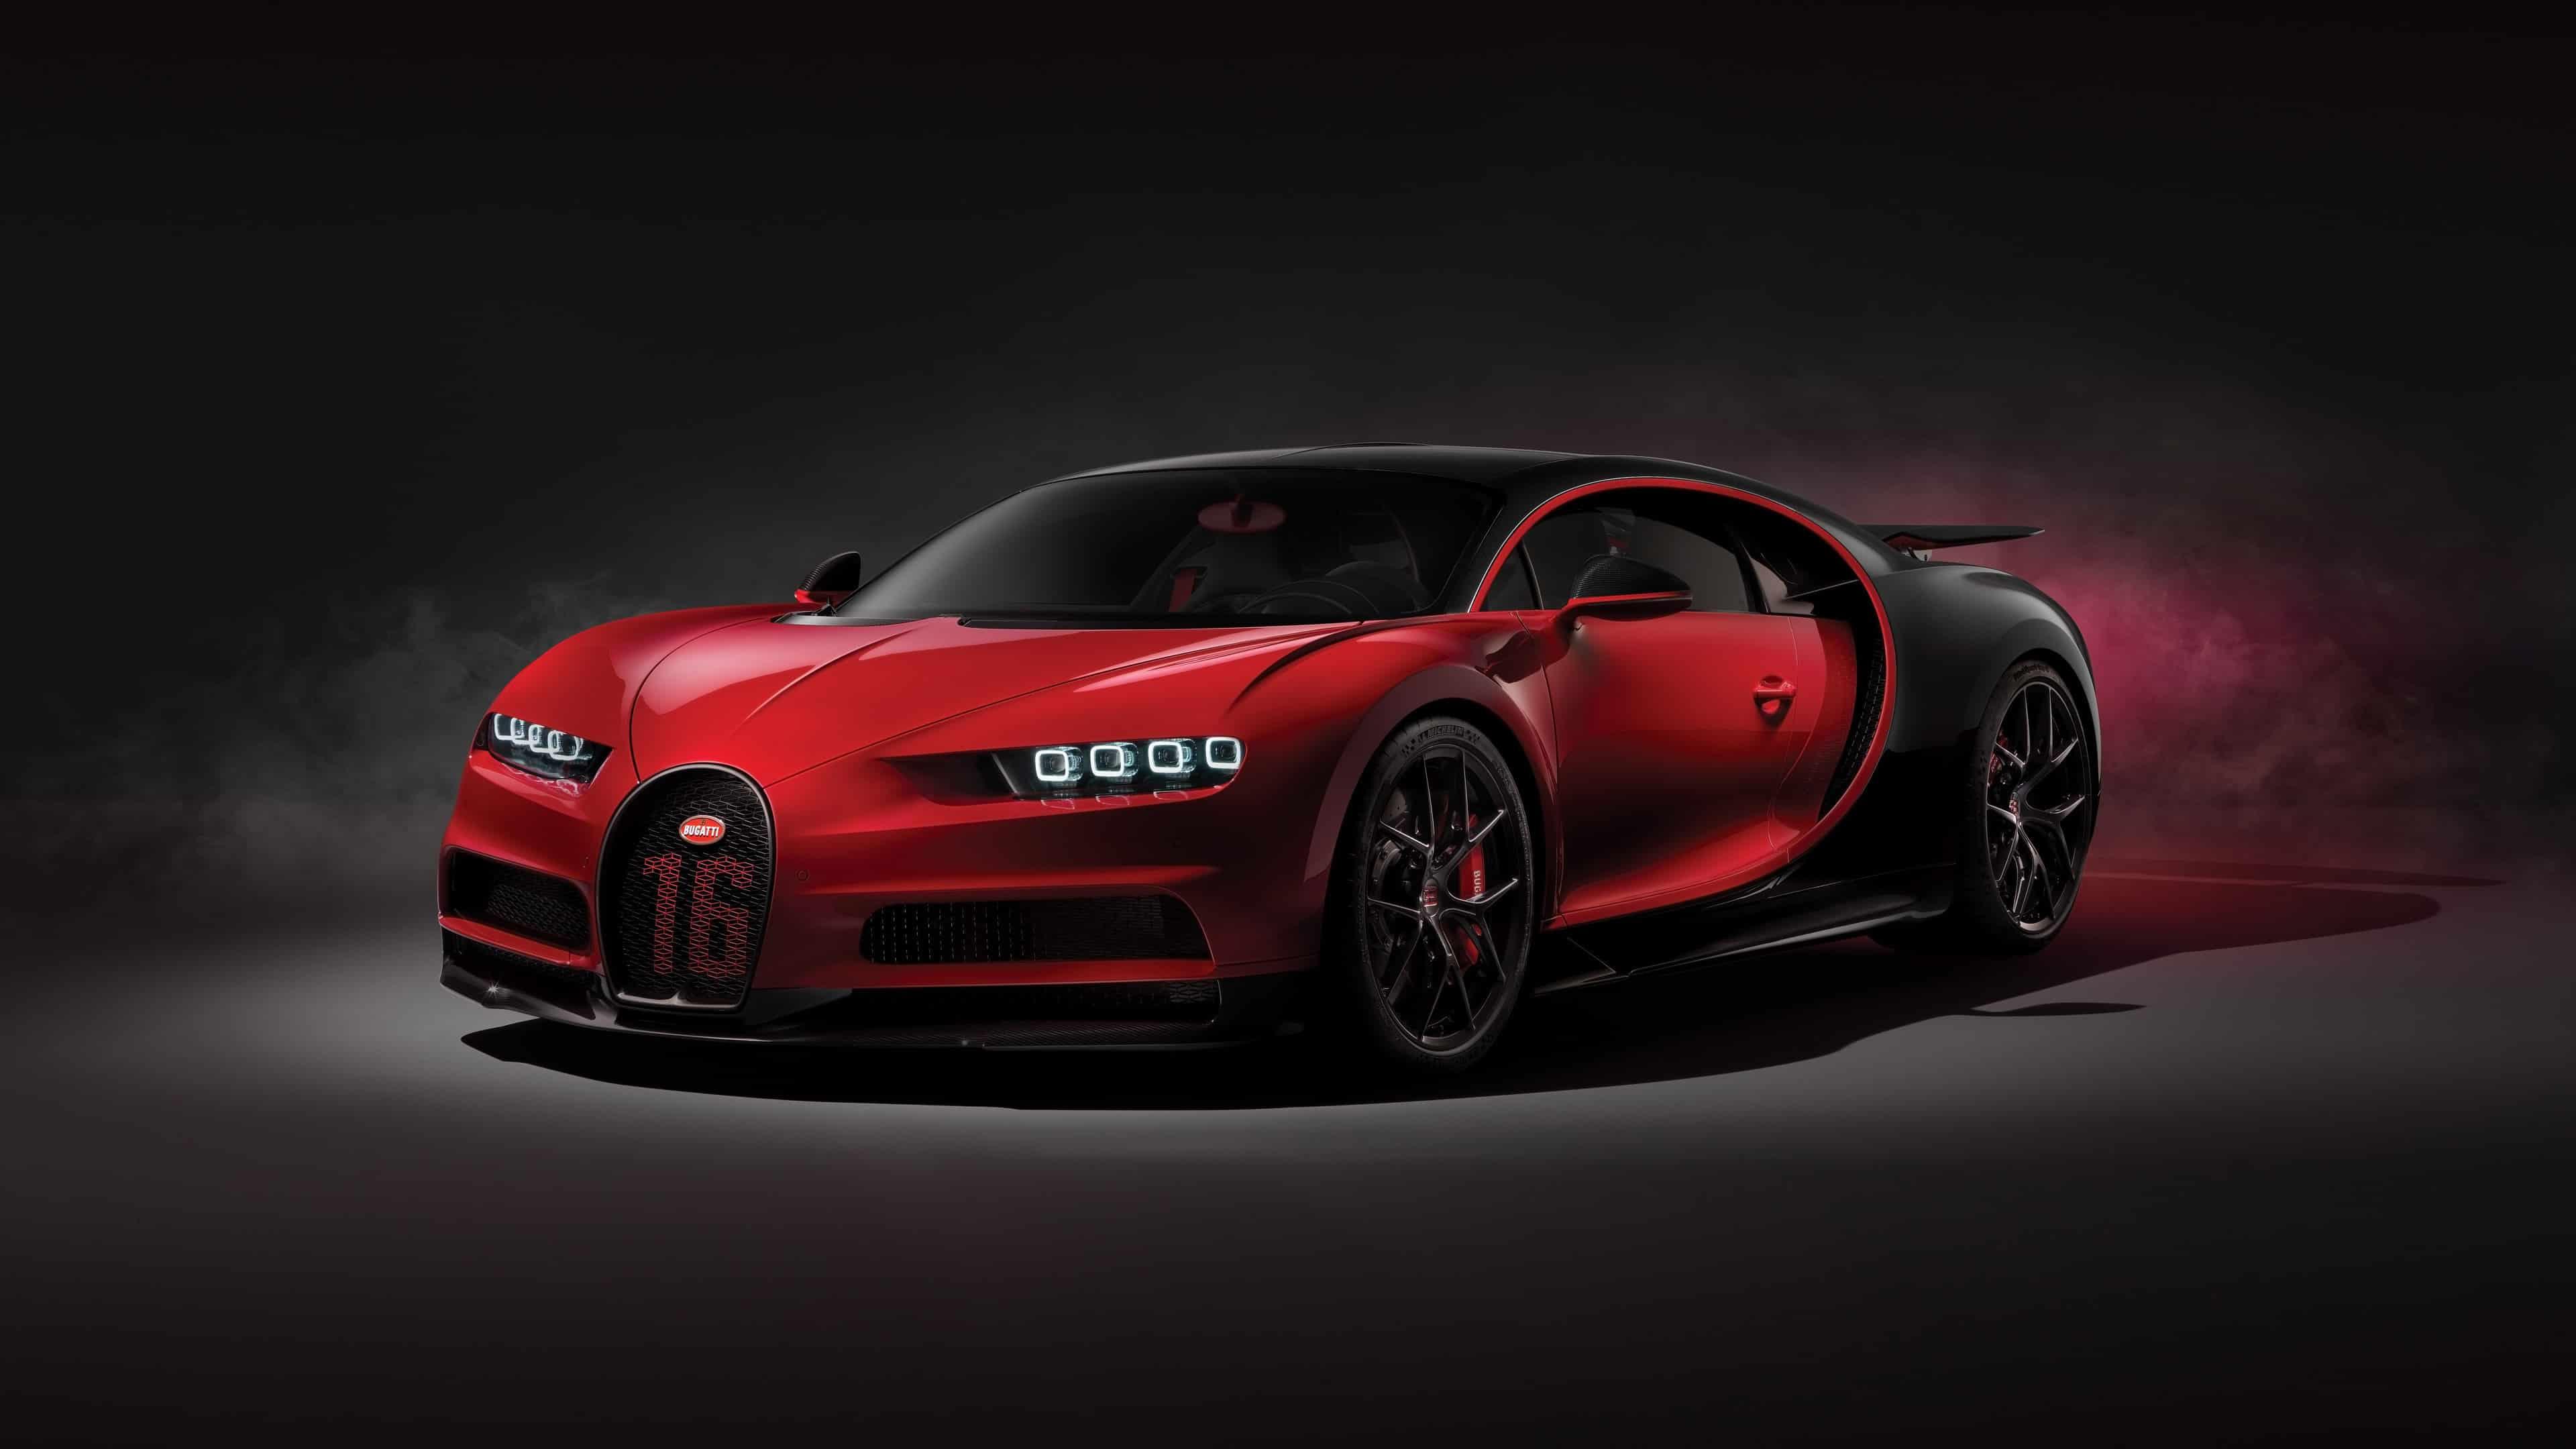 Bugatti Chiron Sport Red UHD 4K Wallpaper Pixelz 3840x2160